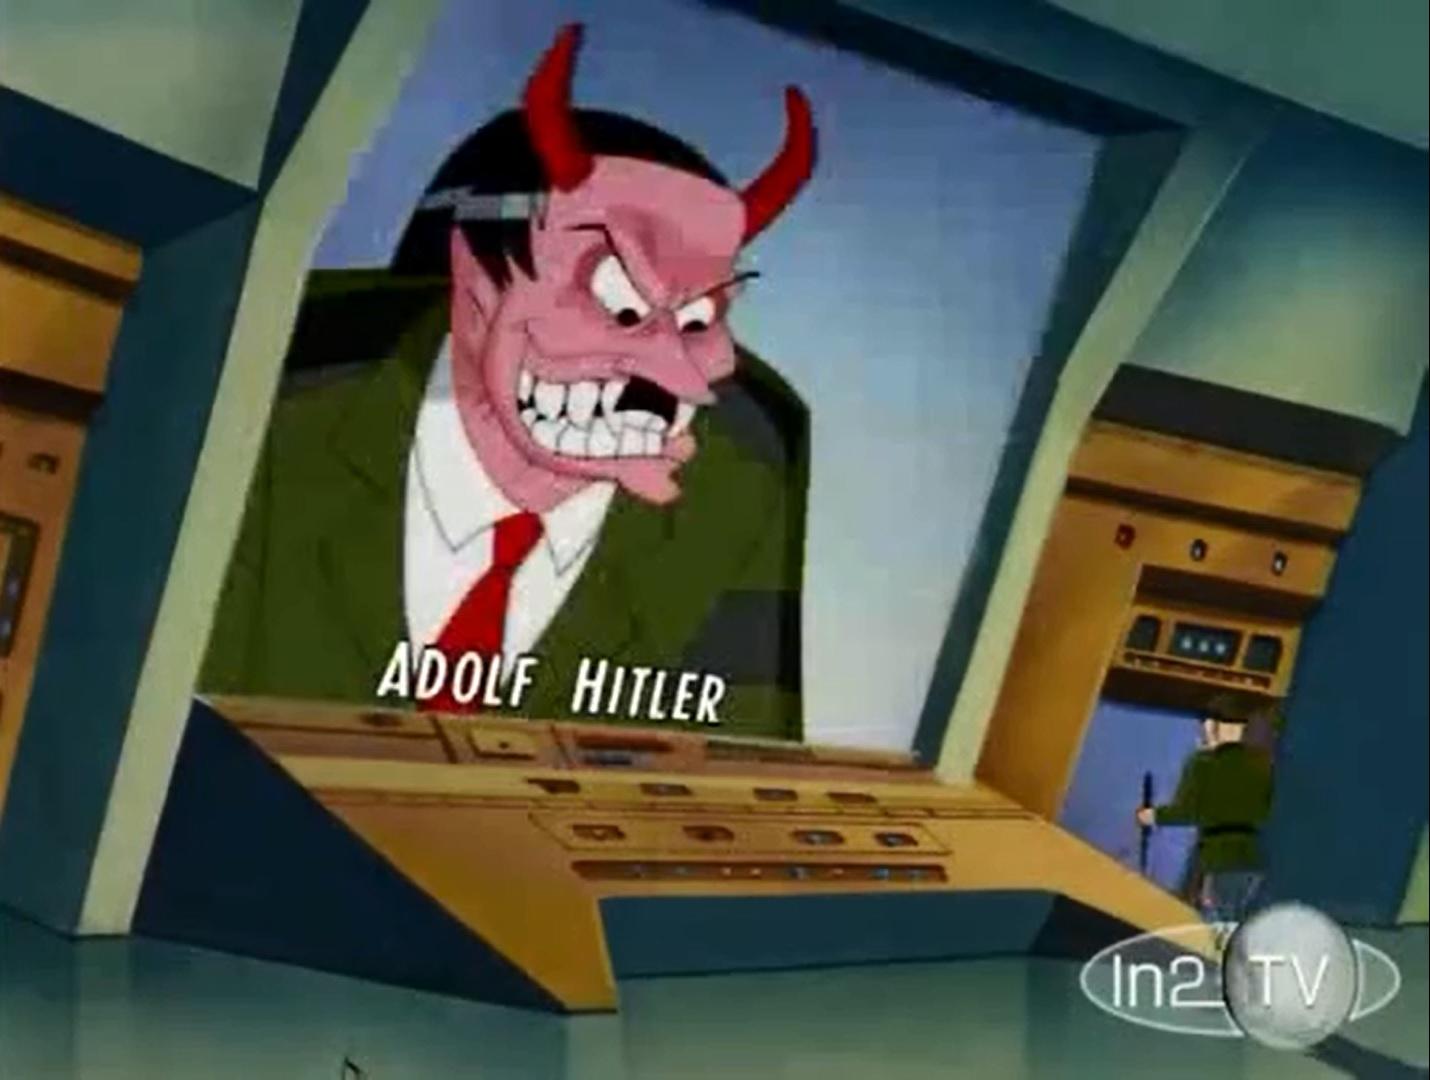 adolf hitler  histeria   - villains wiki - villains  bad guys  comic books  anime